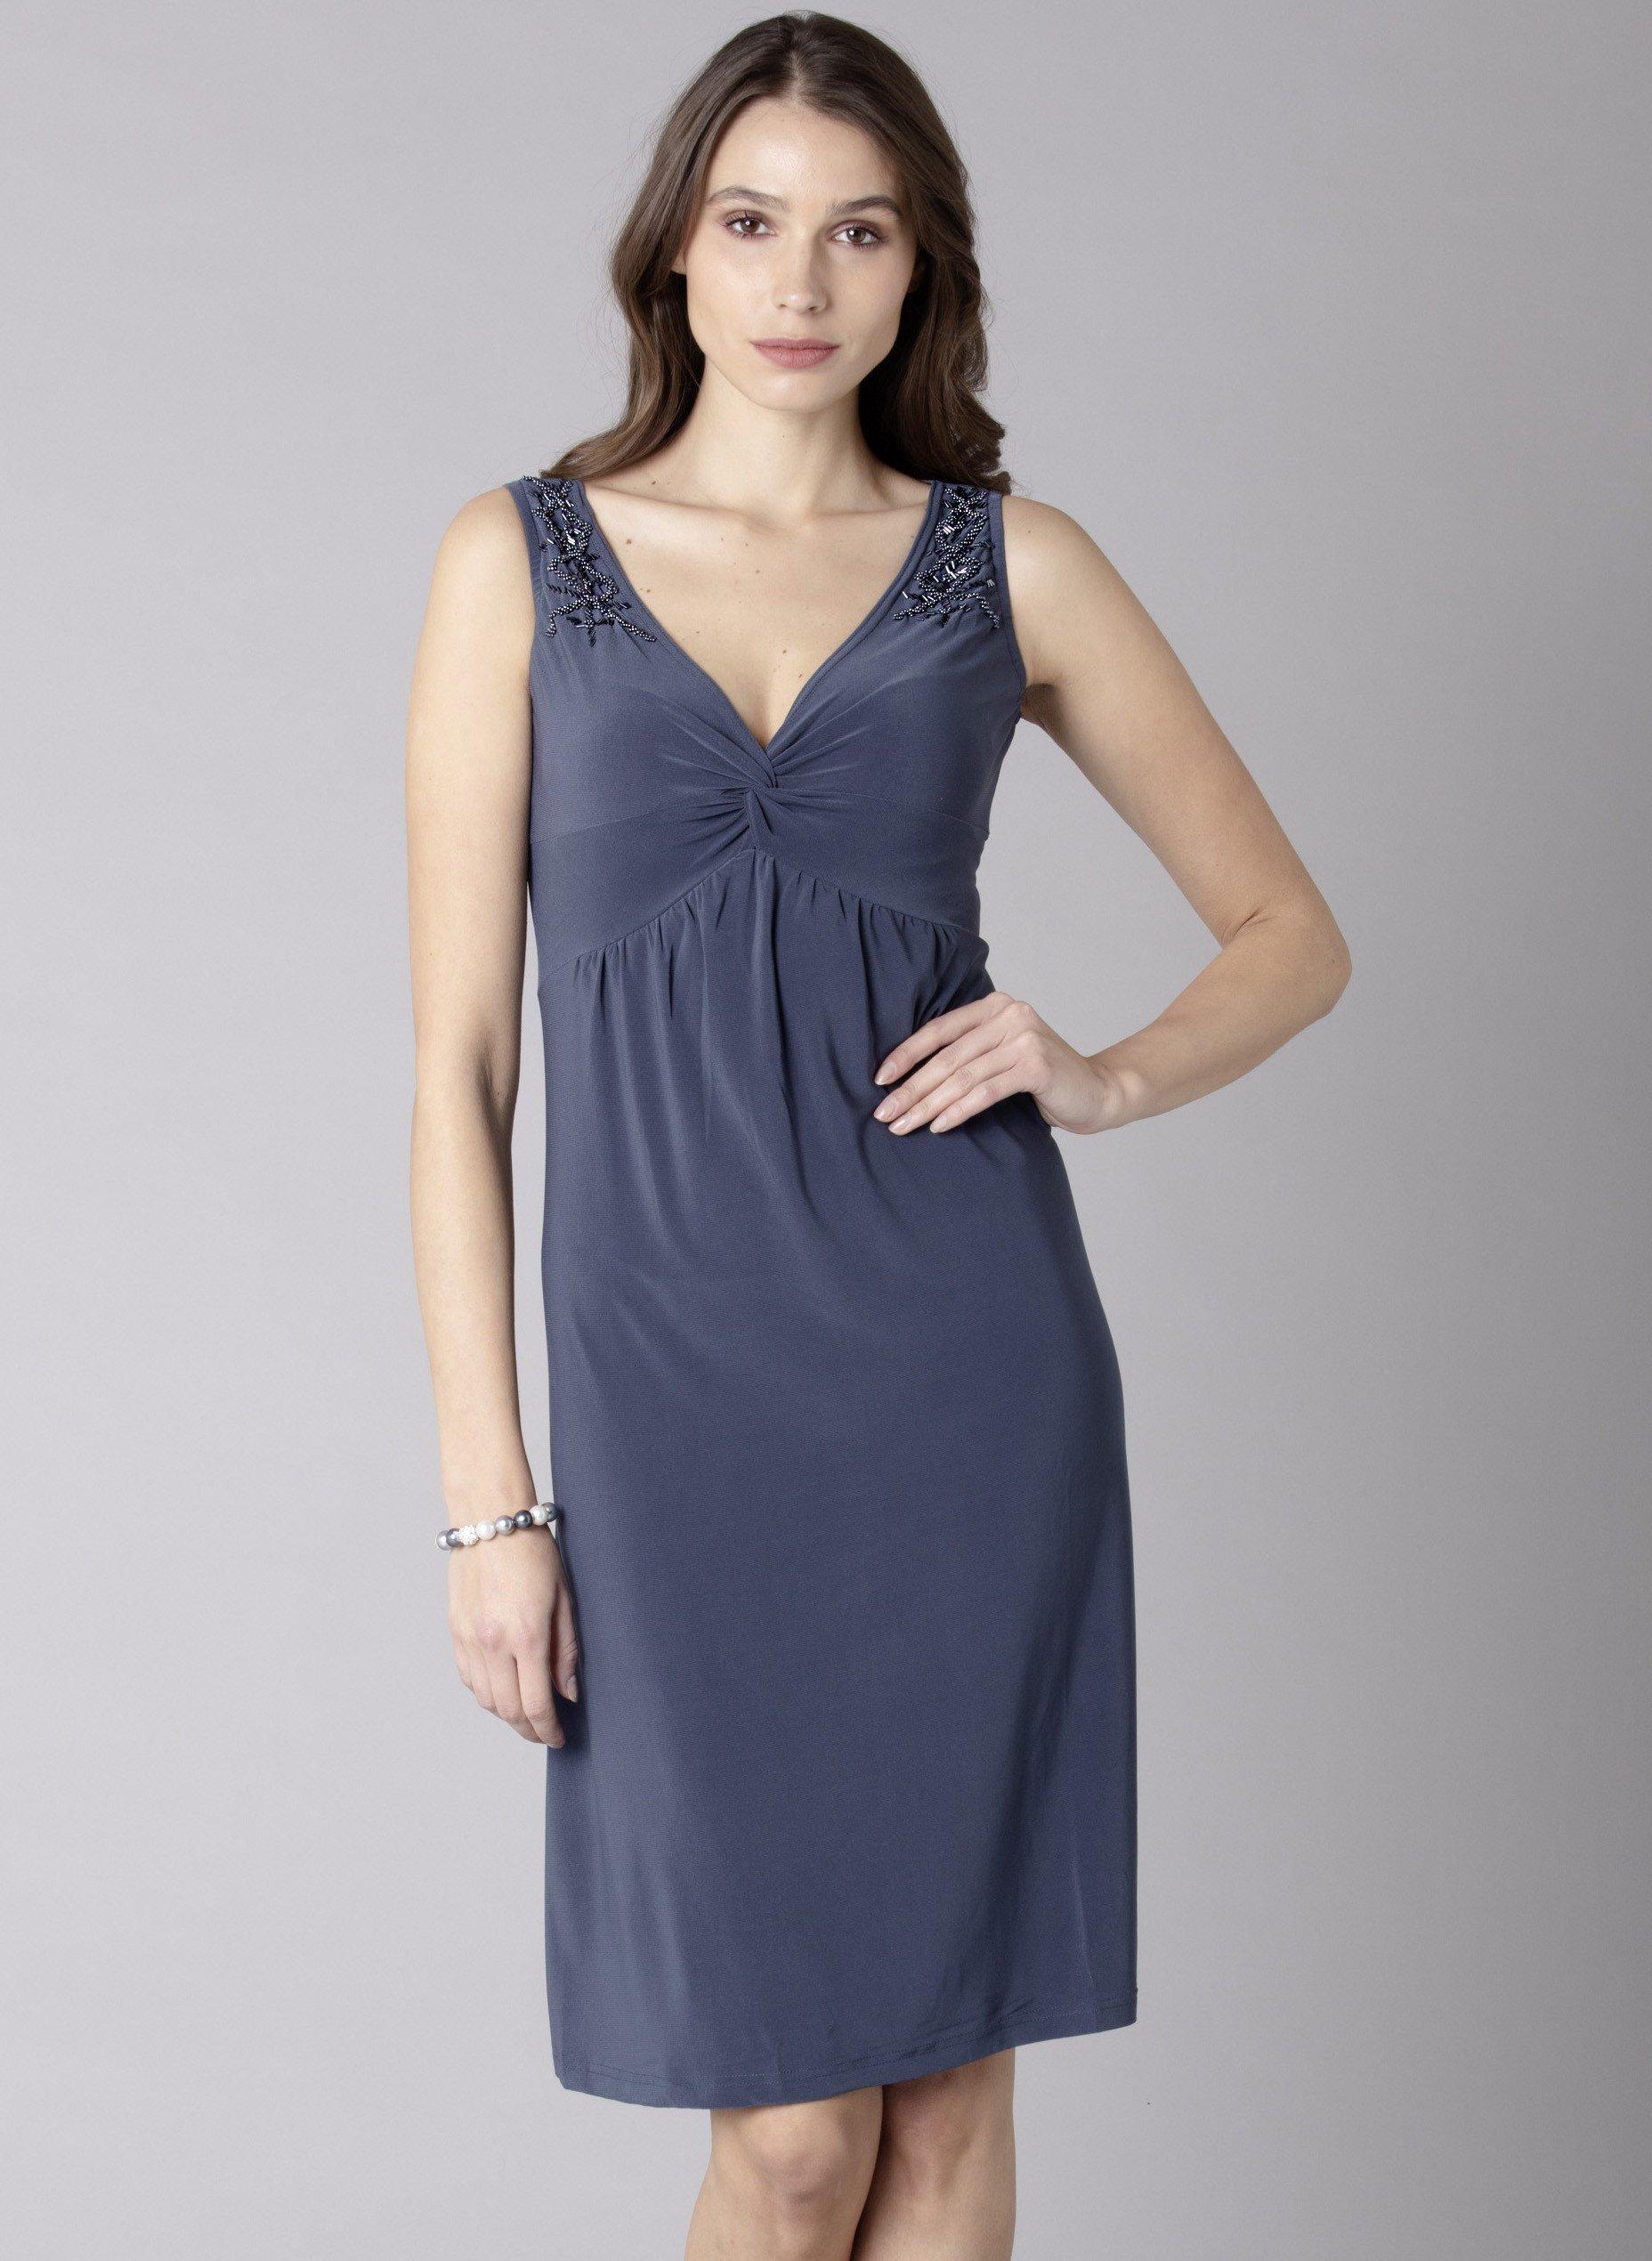 D-AL-Kleid,V-Ausschn. grau L 003